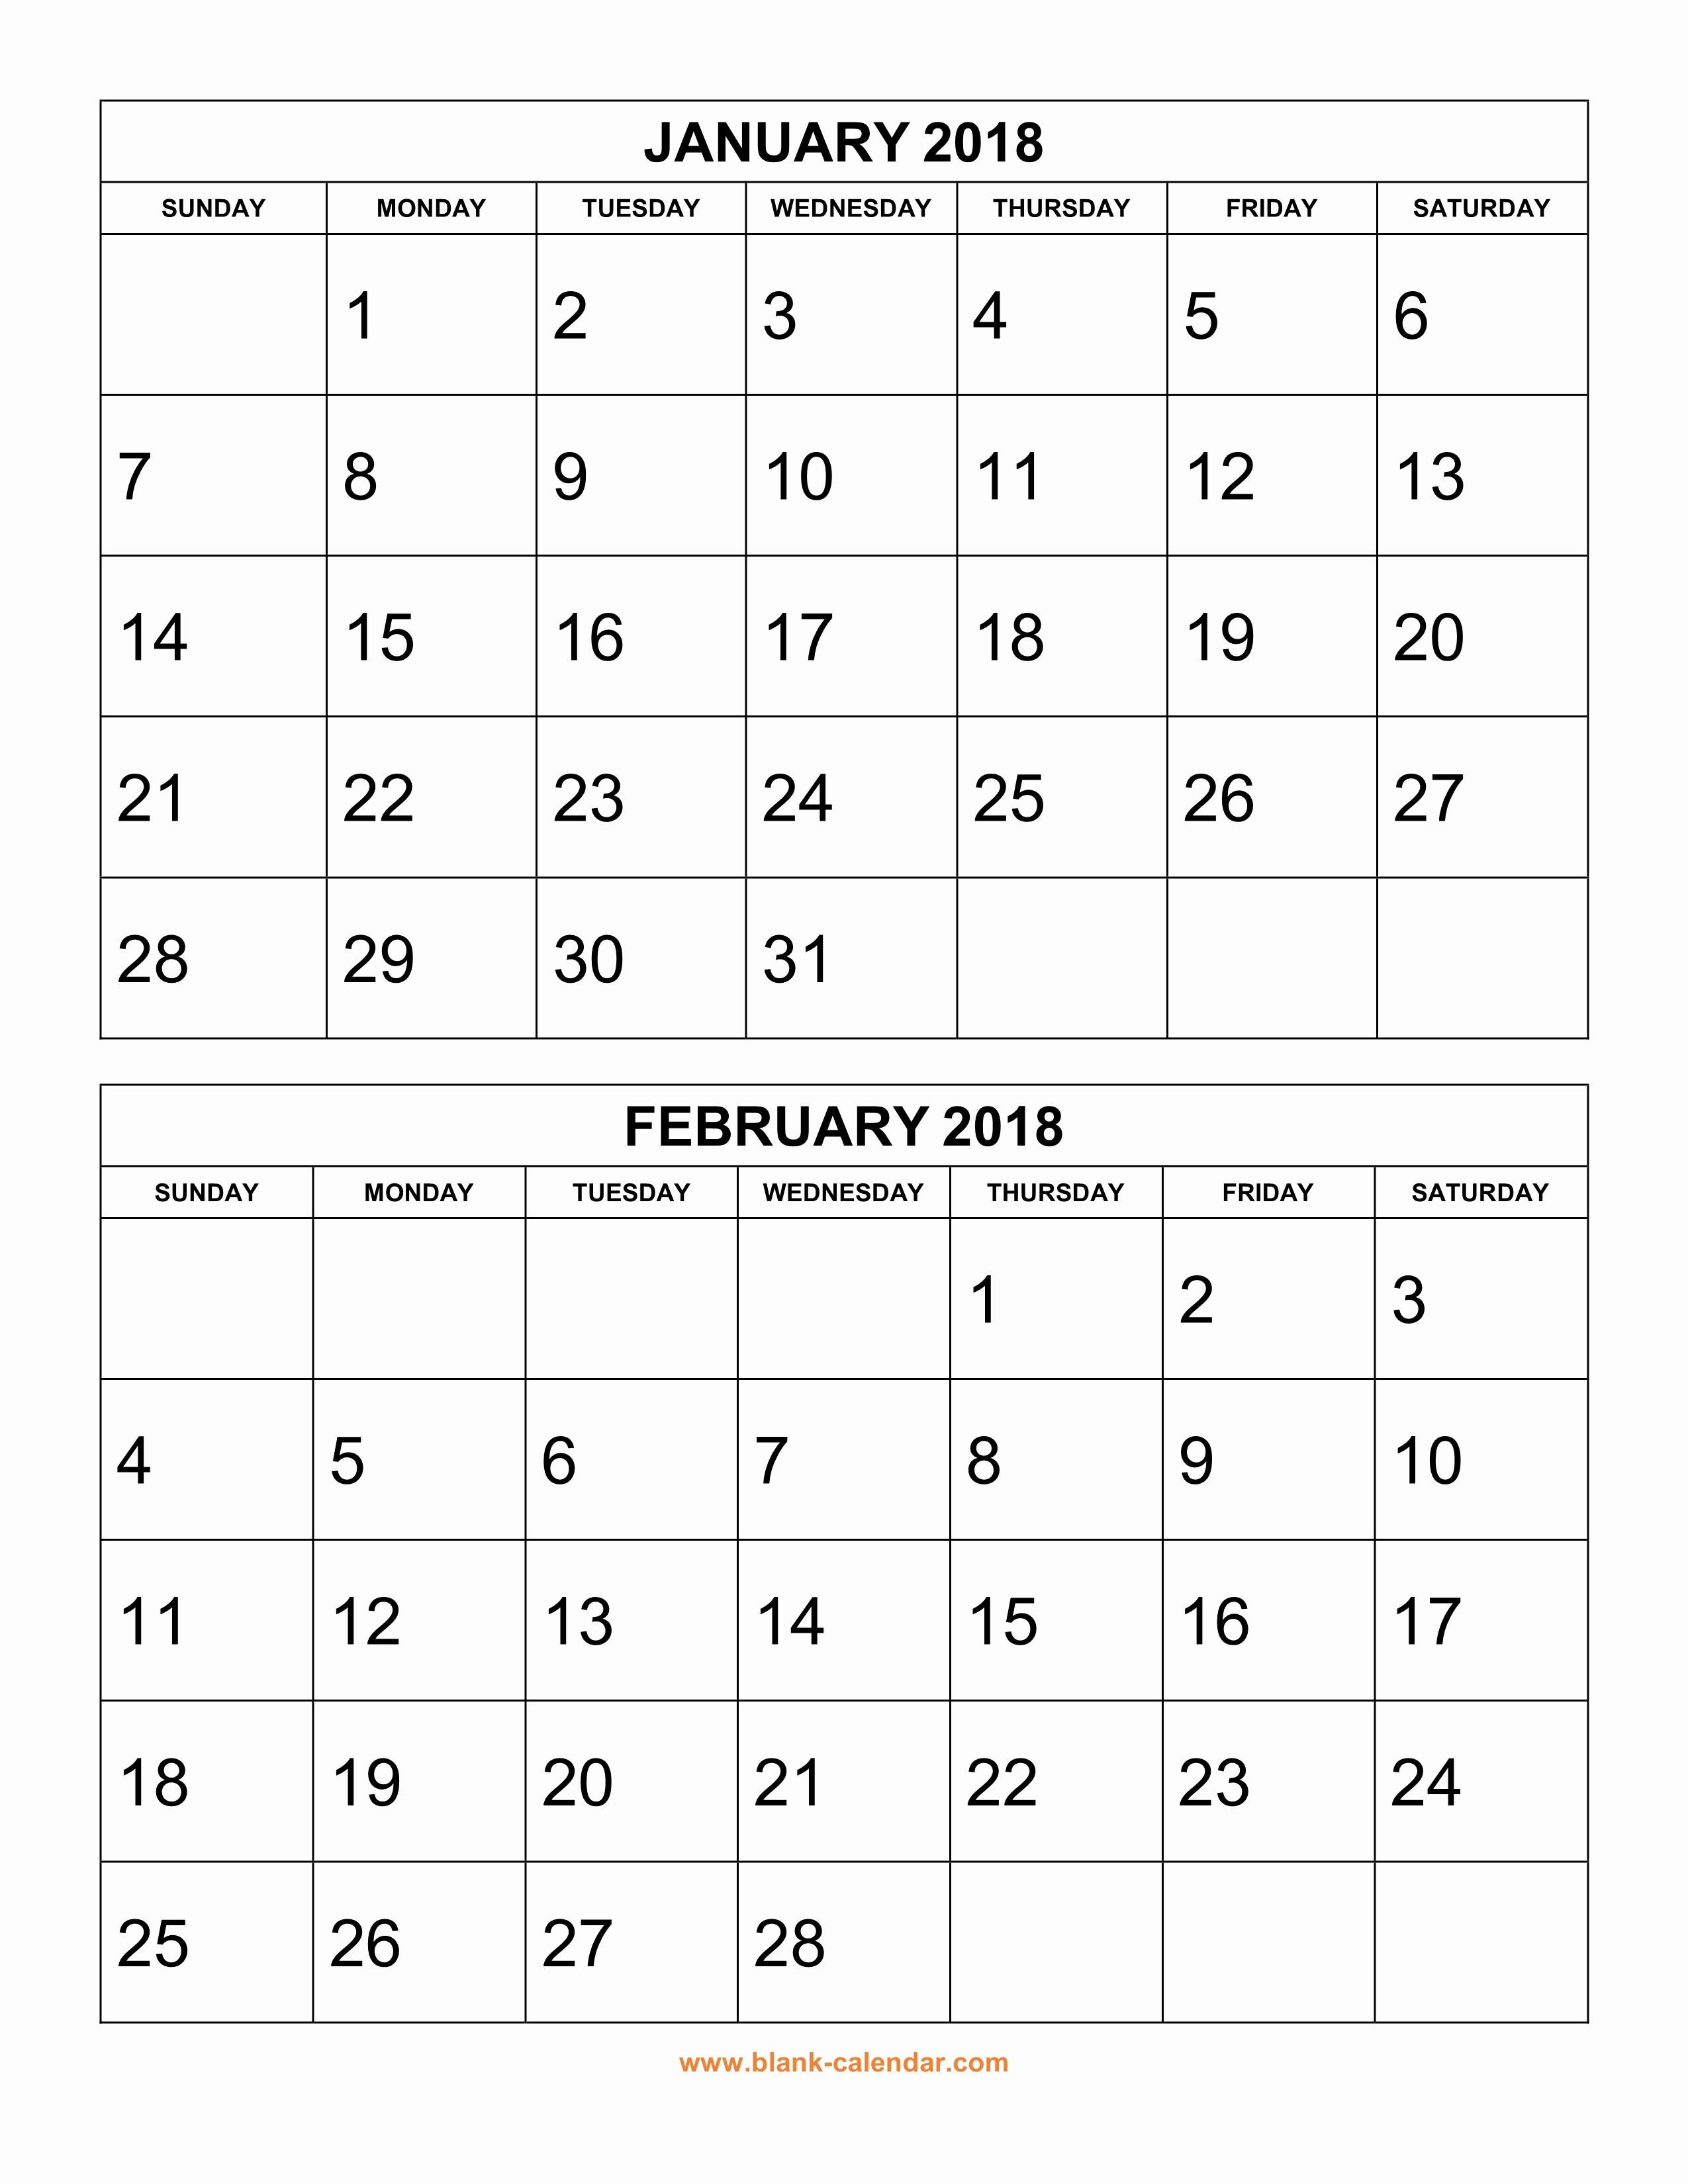 Printable 6 Month Calendar 2018 Inspirational Free Download Printable Calendar 2018 2 Months Per Page